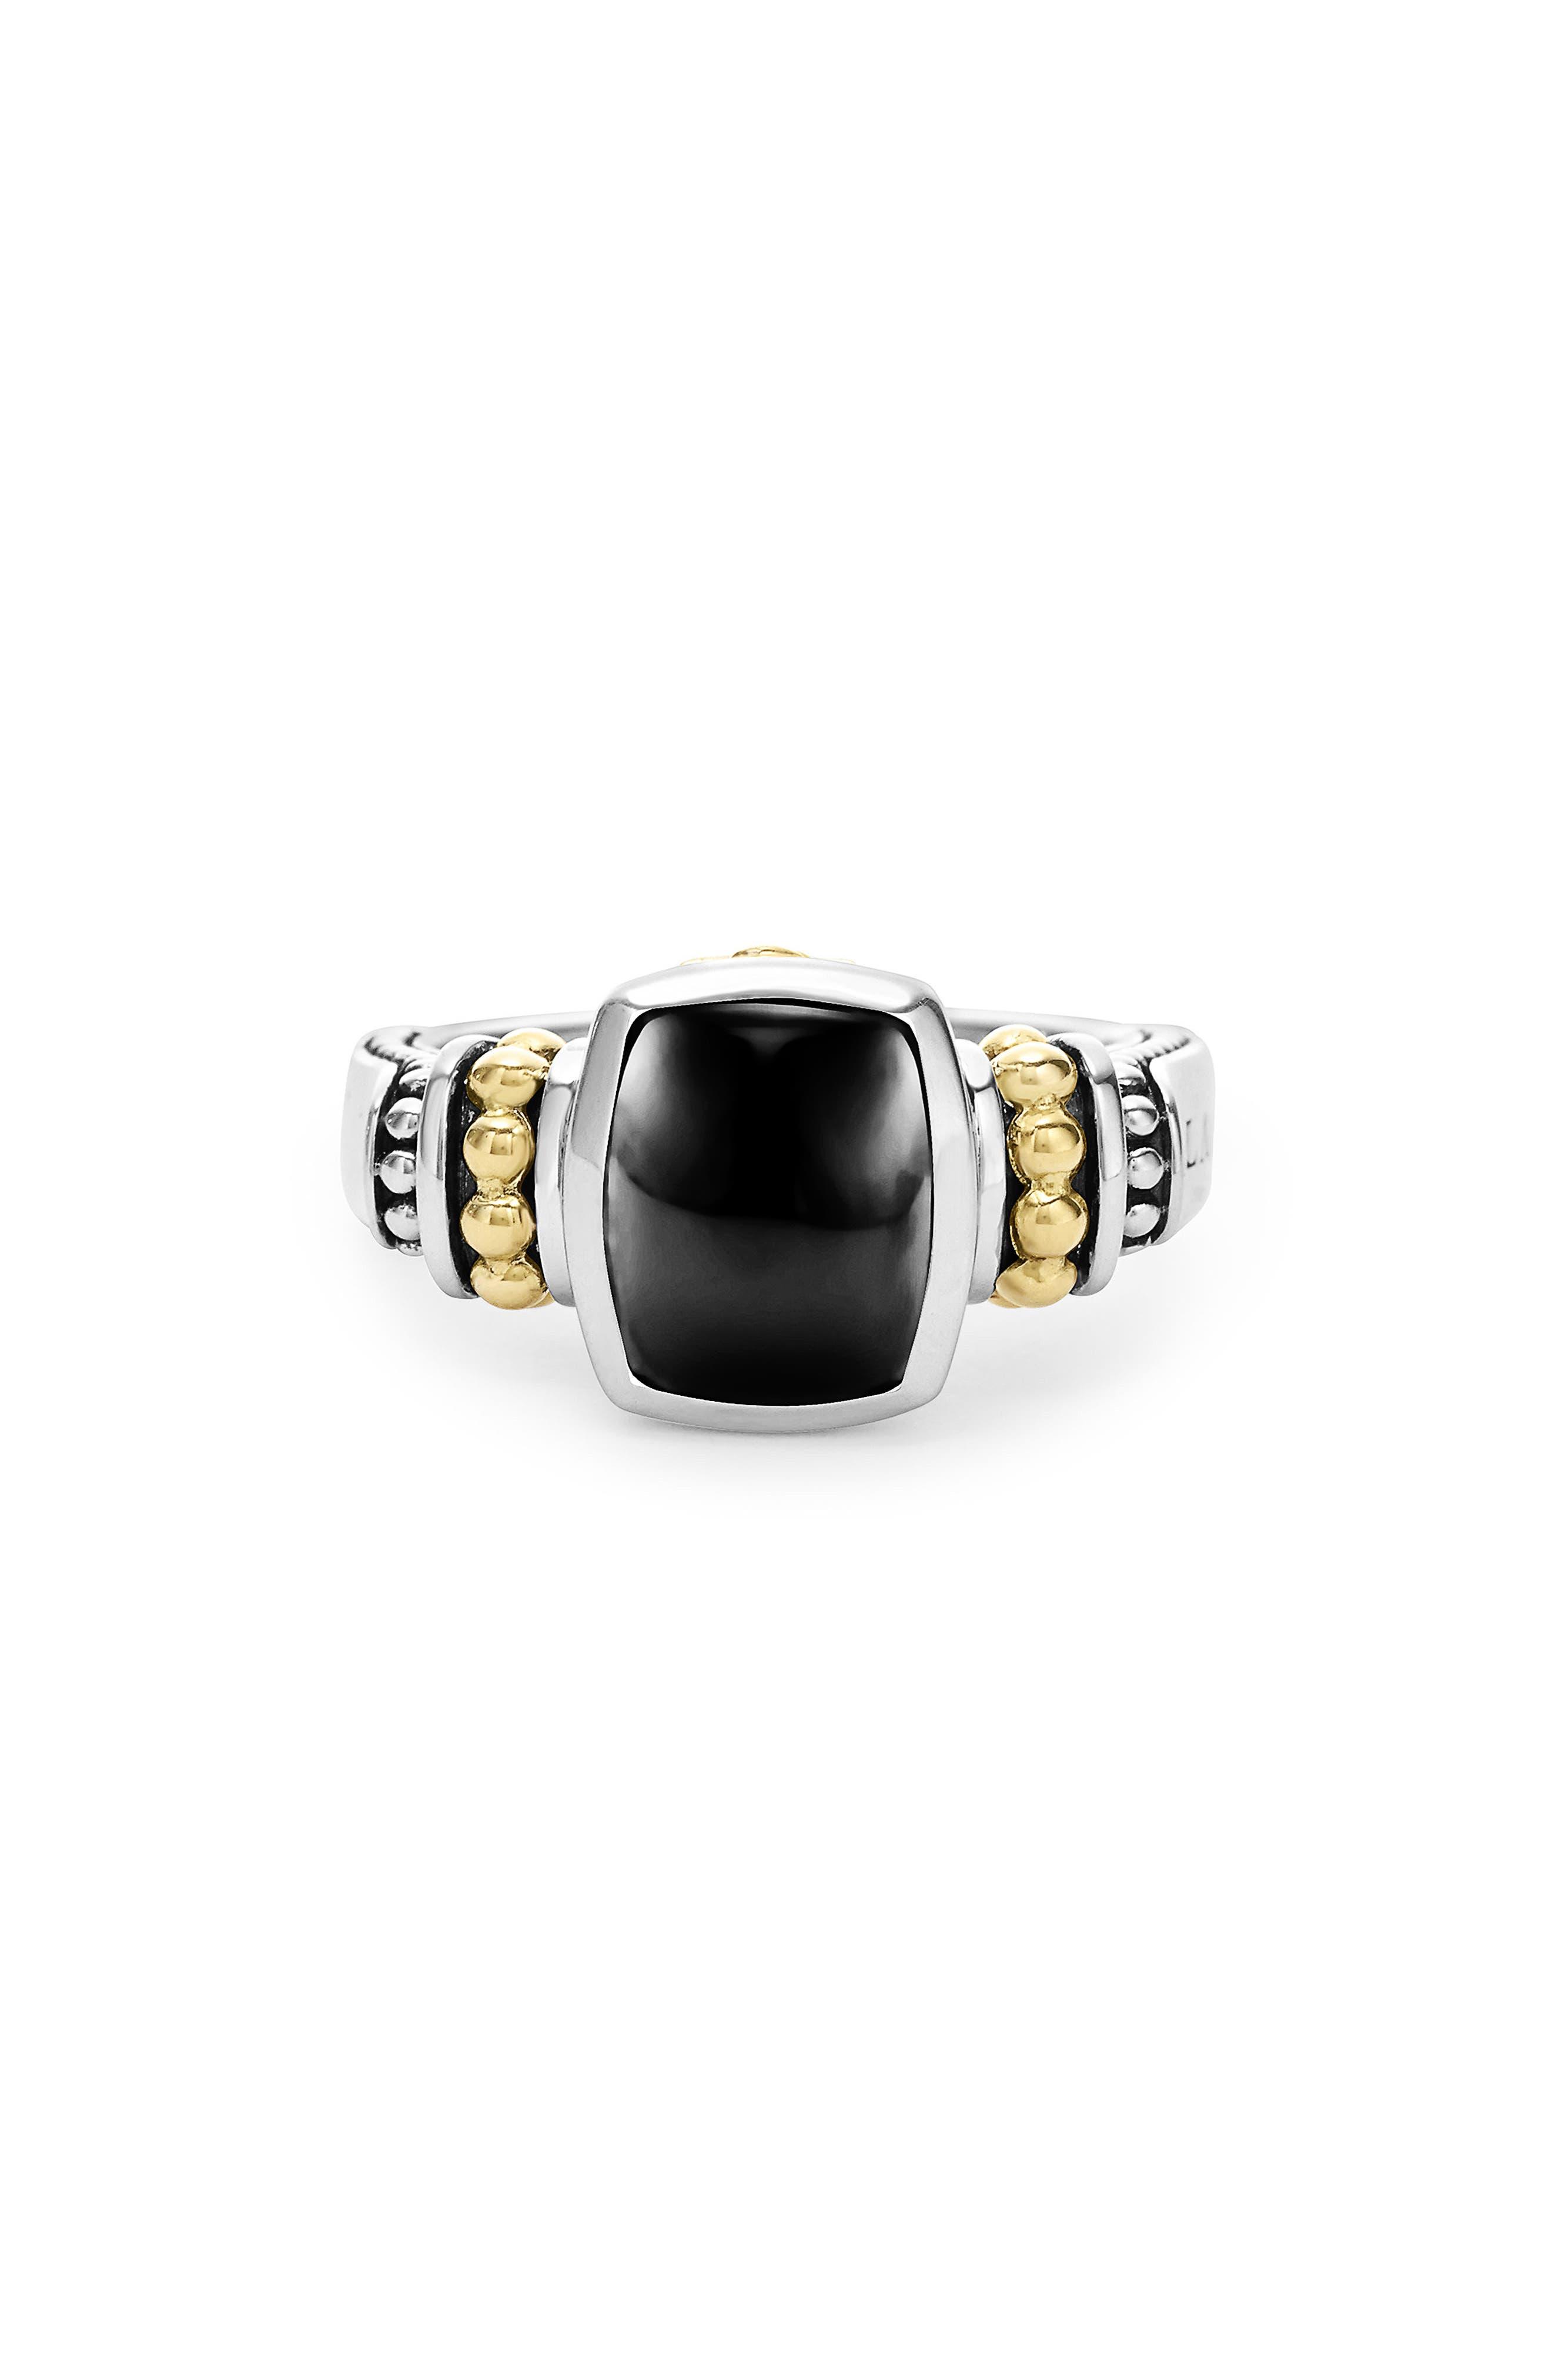 LAGOS 'Caviar Color' Small Semiprecious Stone Ring